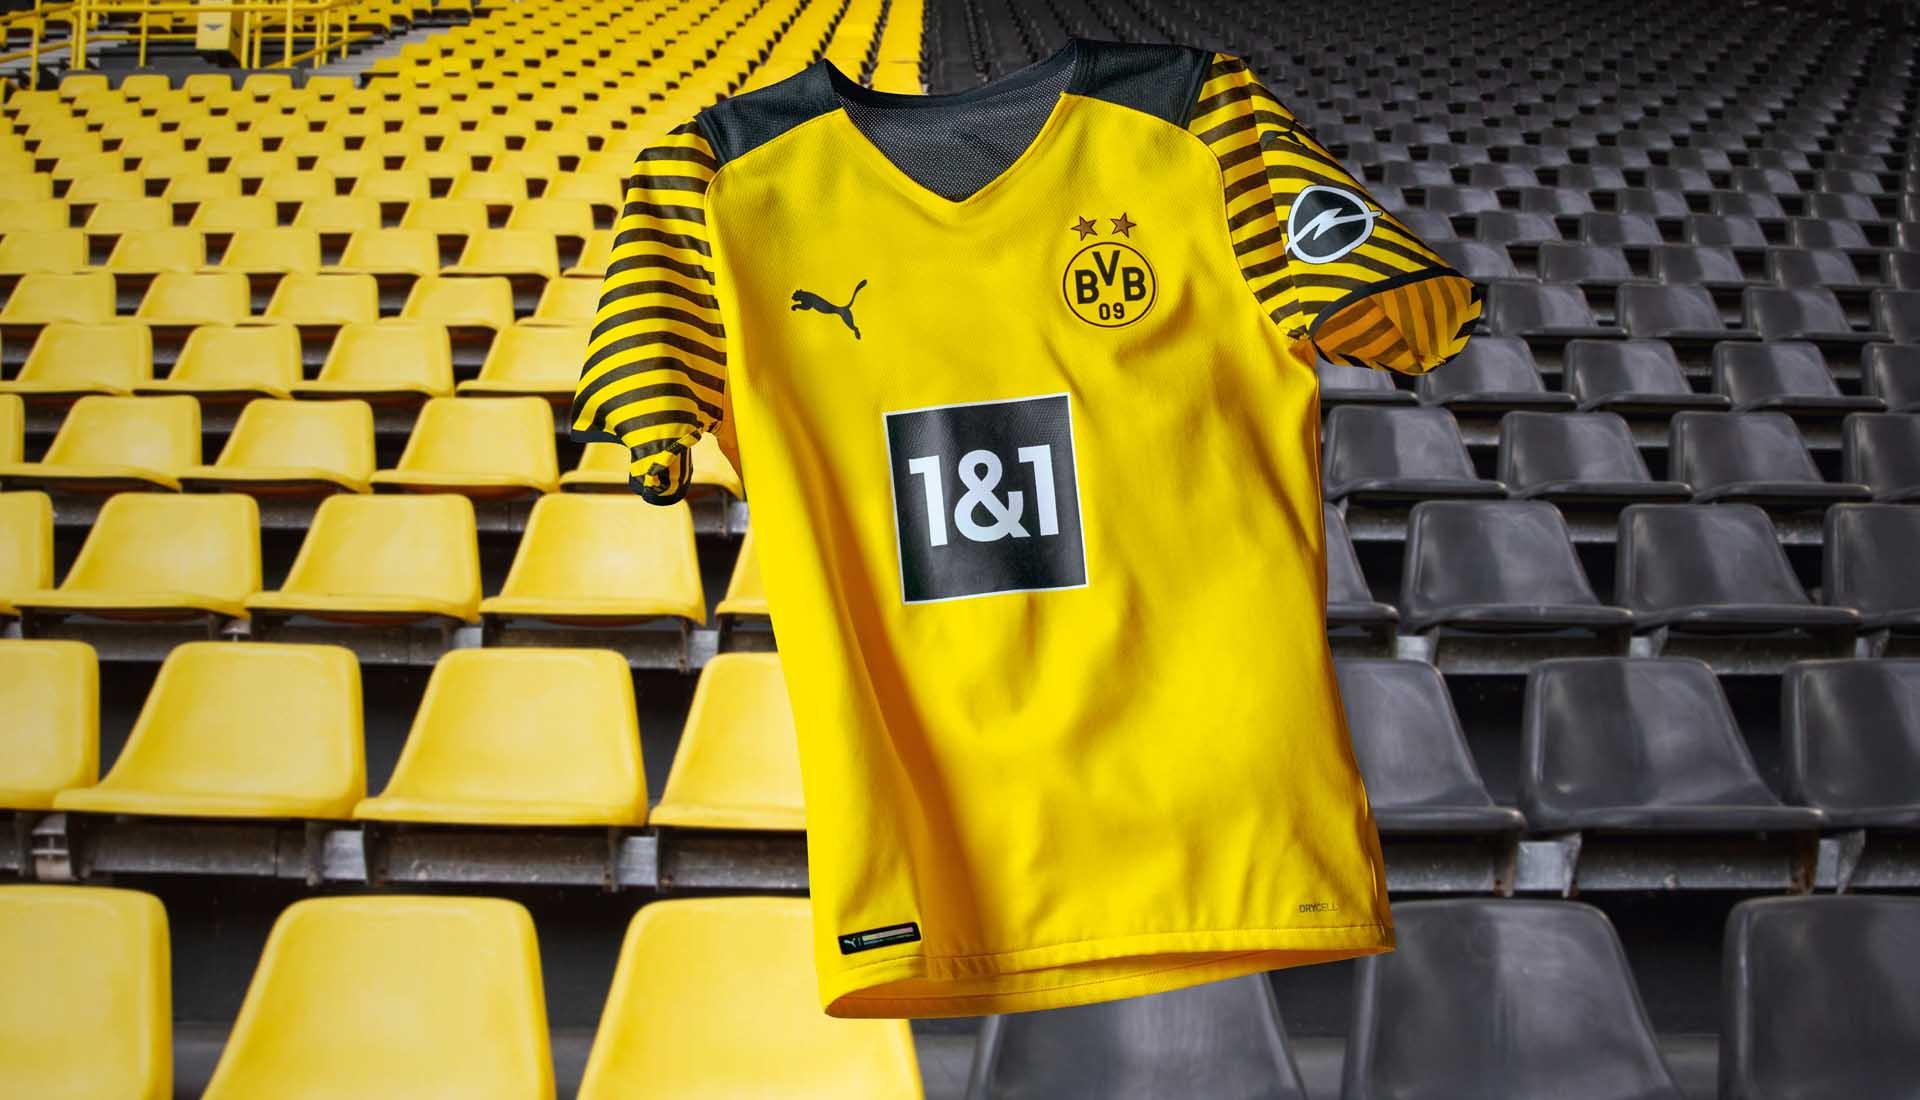 PUMA Launch Borussia Dortmund 21/22 Home Shirt - SoccerBible